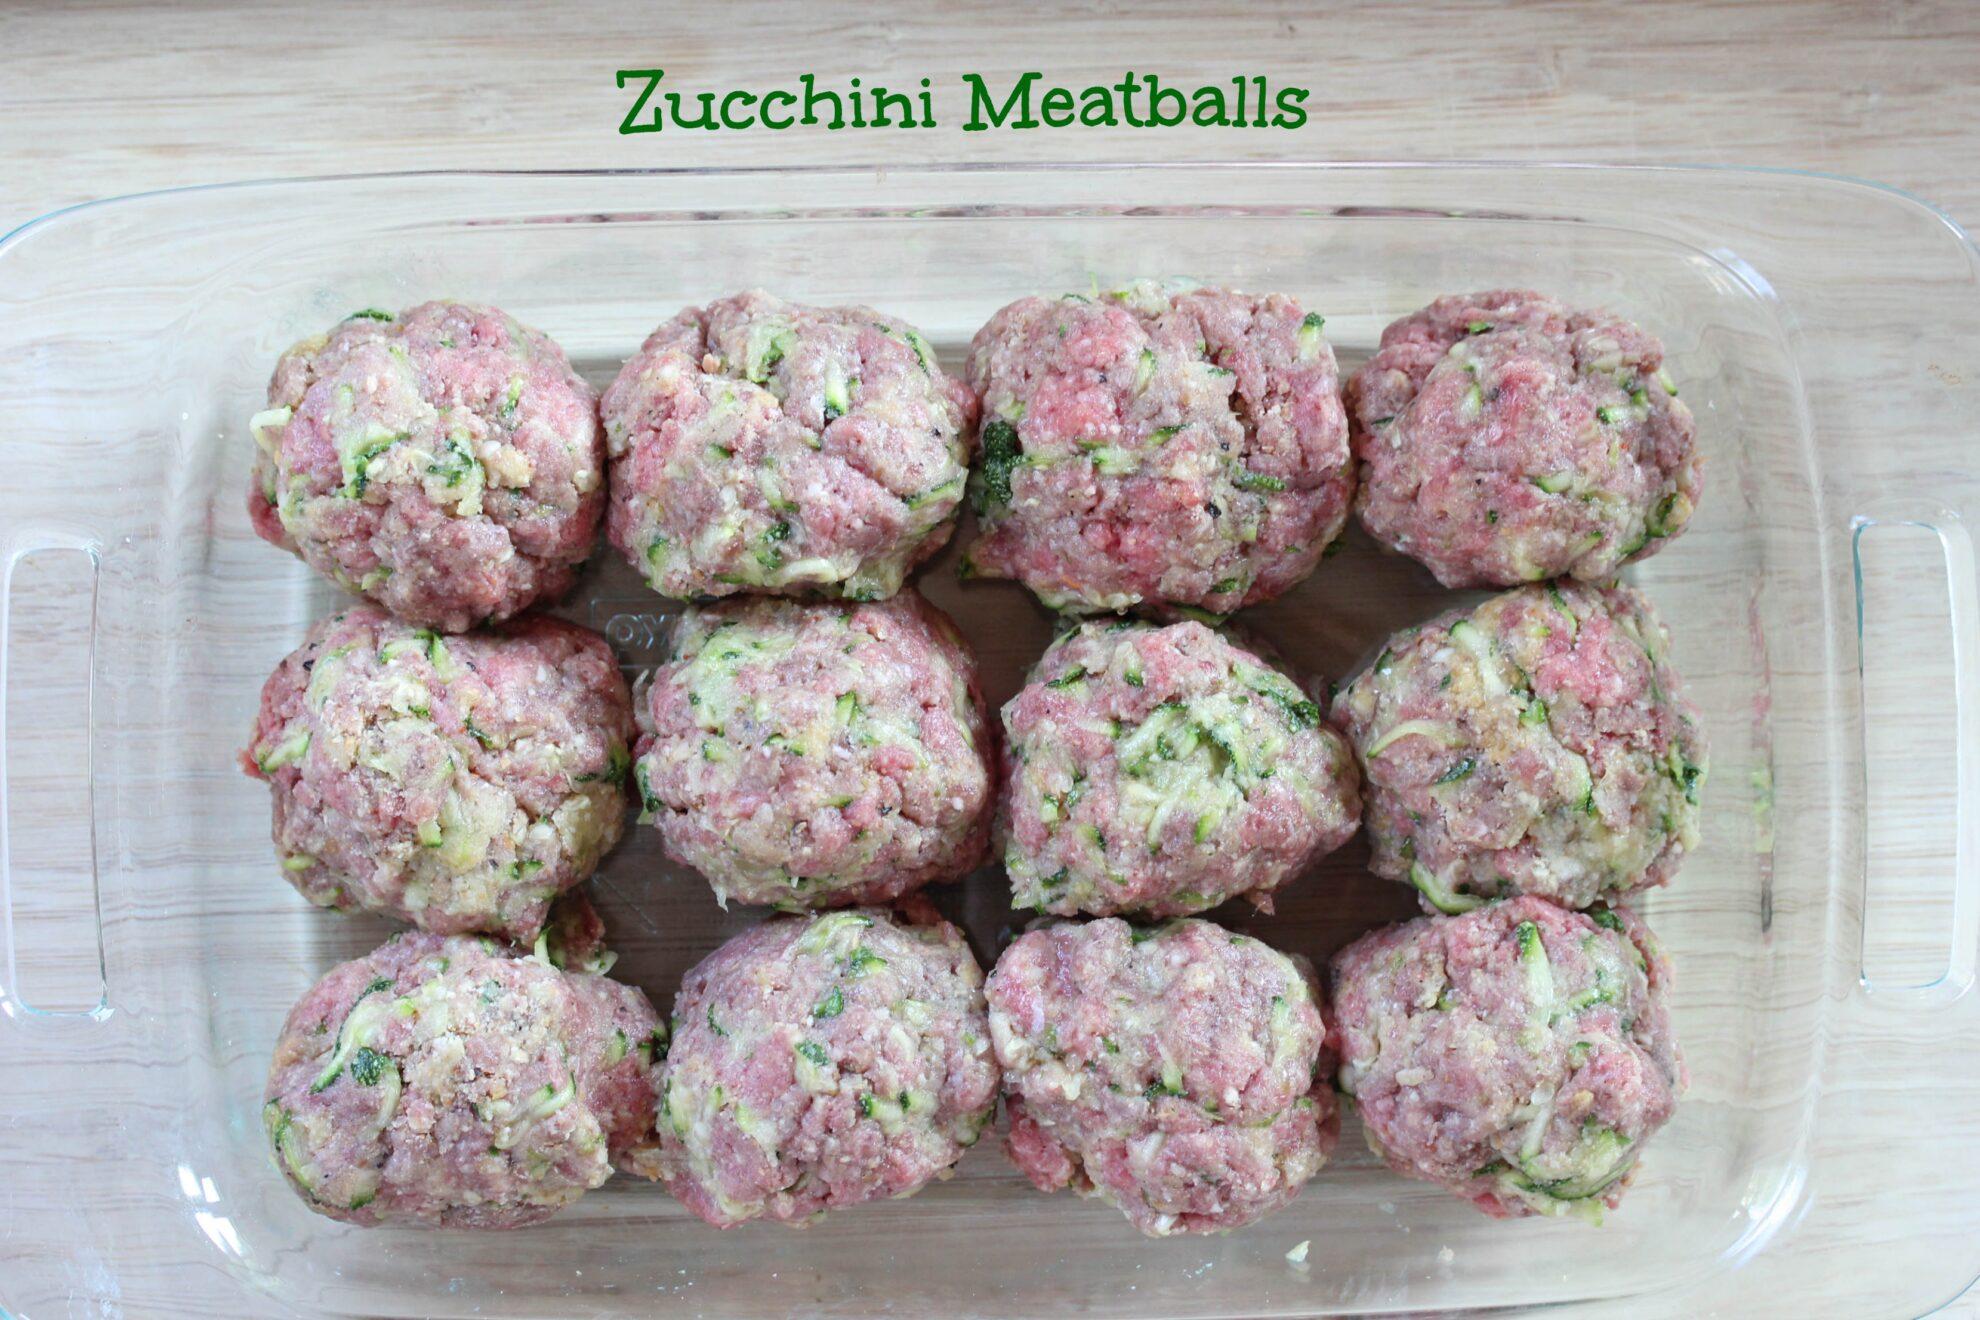 Meatballs with Zucchini